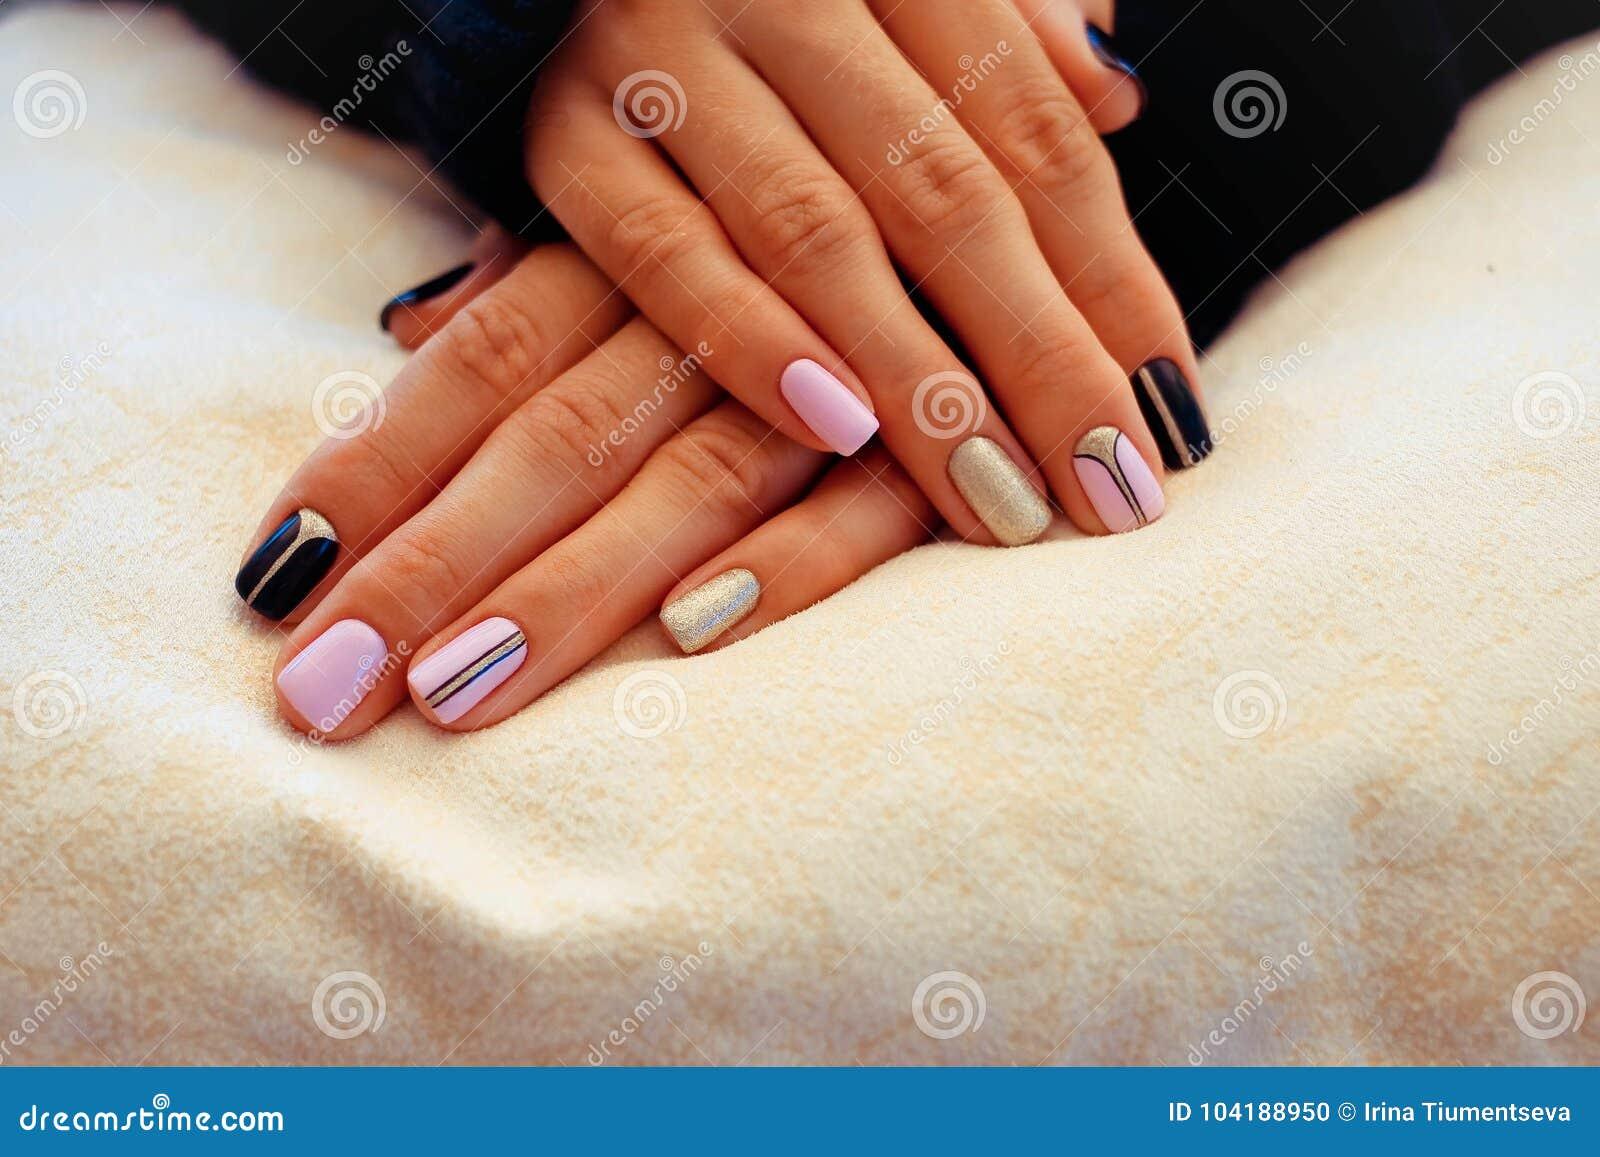 Stylish Nails Nailpolish Nail Art Design For The Fashion Style